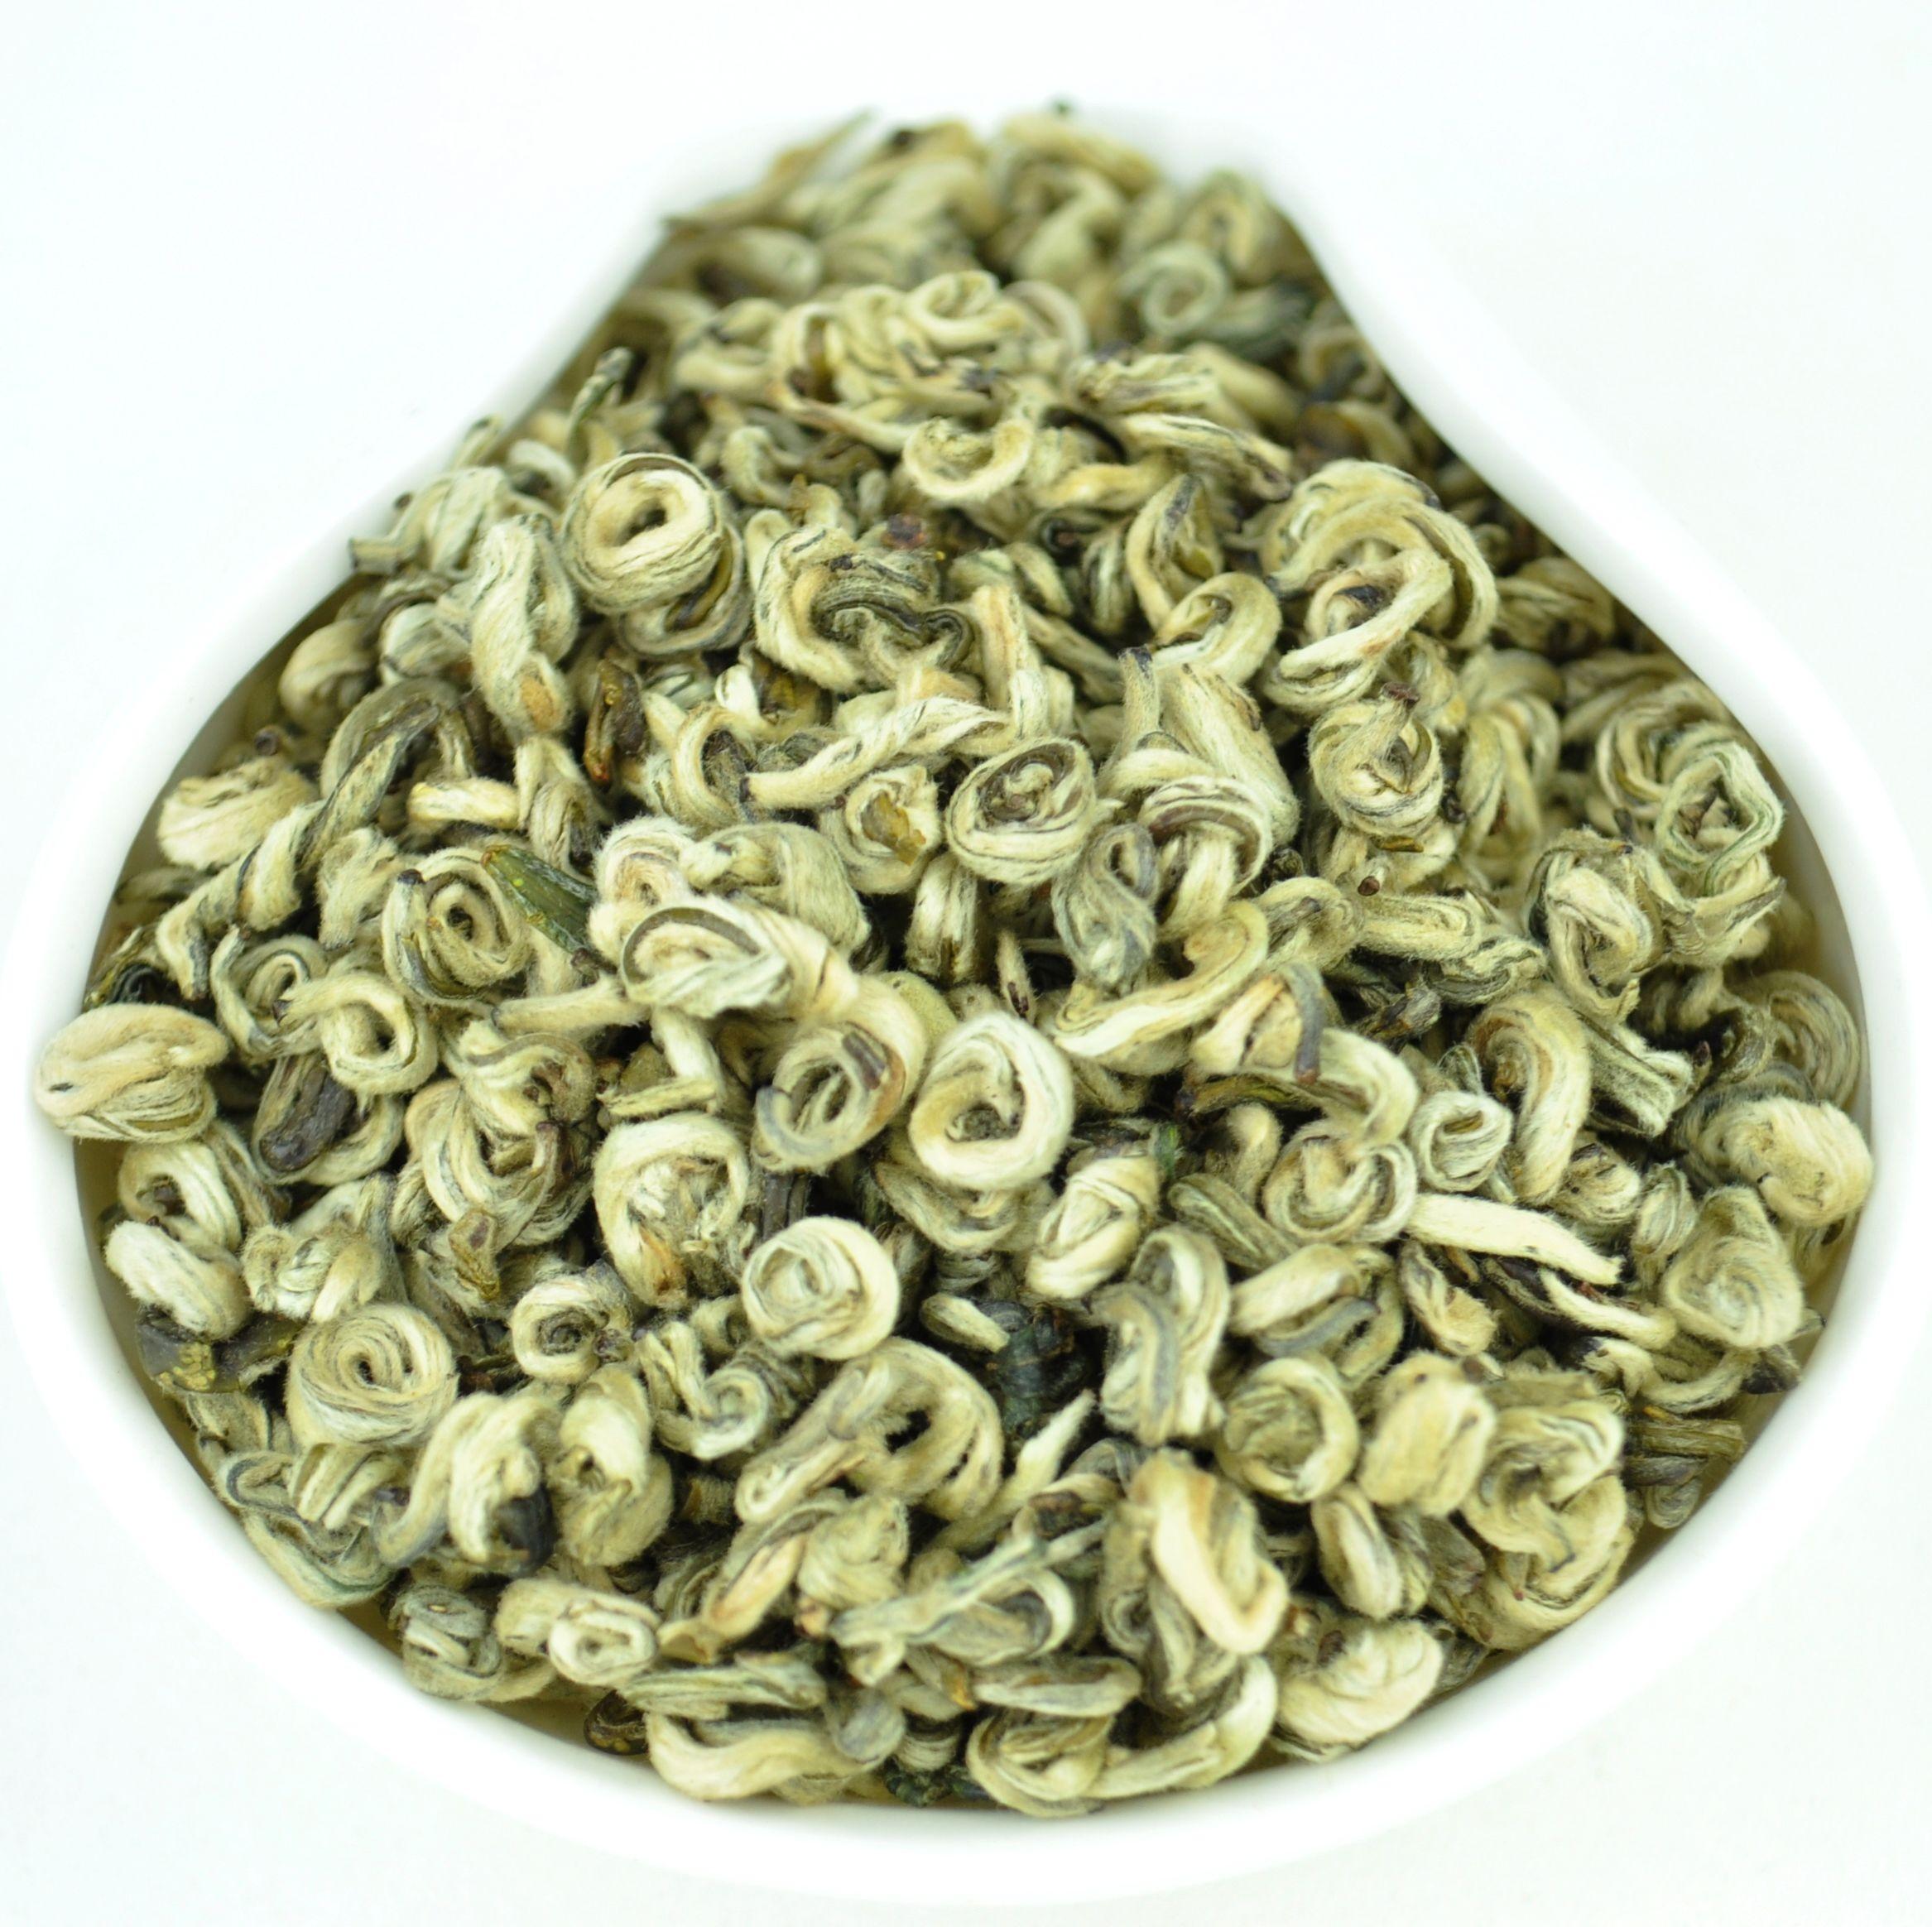 Imperial Grade Pure Bud Bi Luo Chun Green Tea * Spring 2016